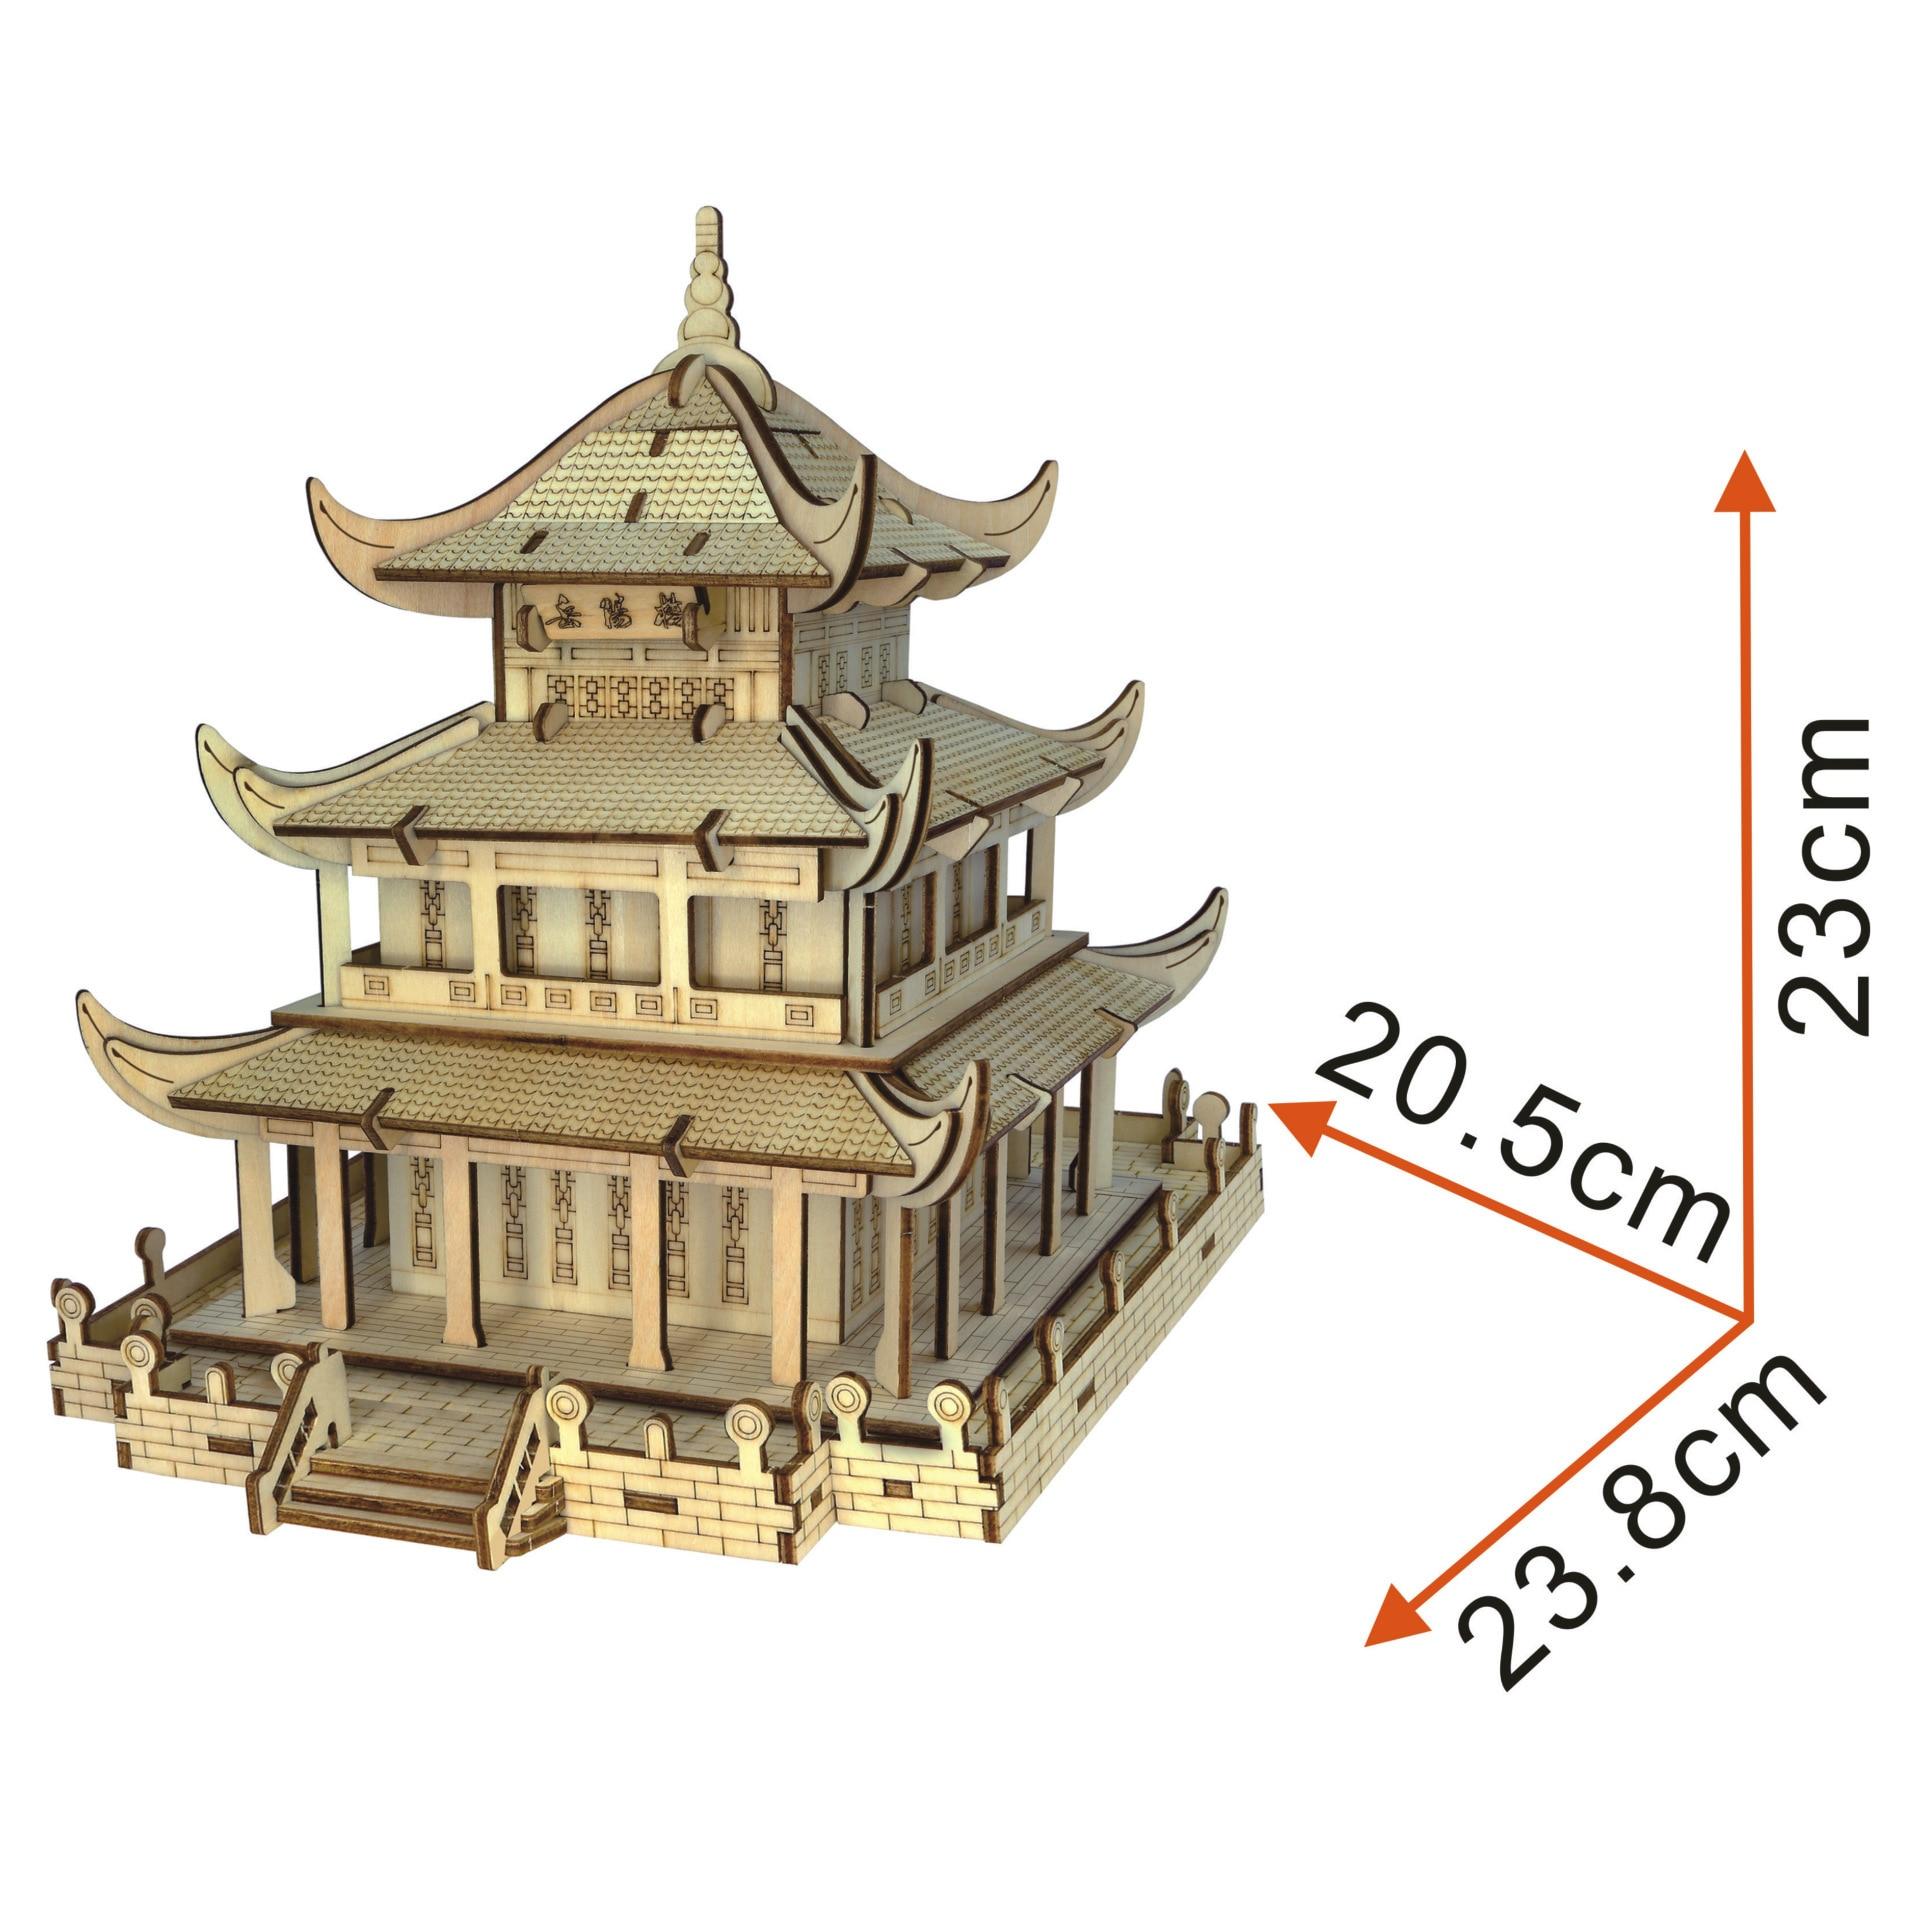 3D Holz Jigsaw Puzzle Laser Schneiden DIY Dreidimensionale Jigsaw Puzzle DIY Handgemachte Spielzeug Yueyang Turm Farbe Box - 2